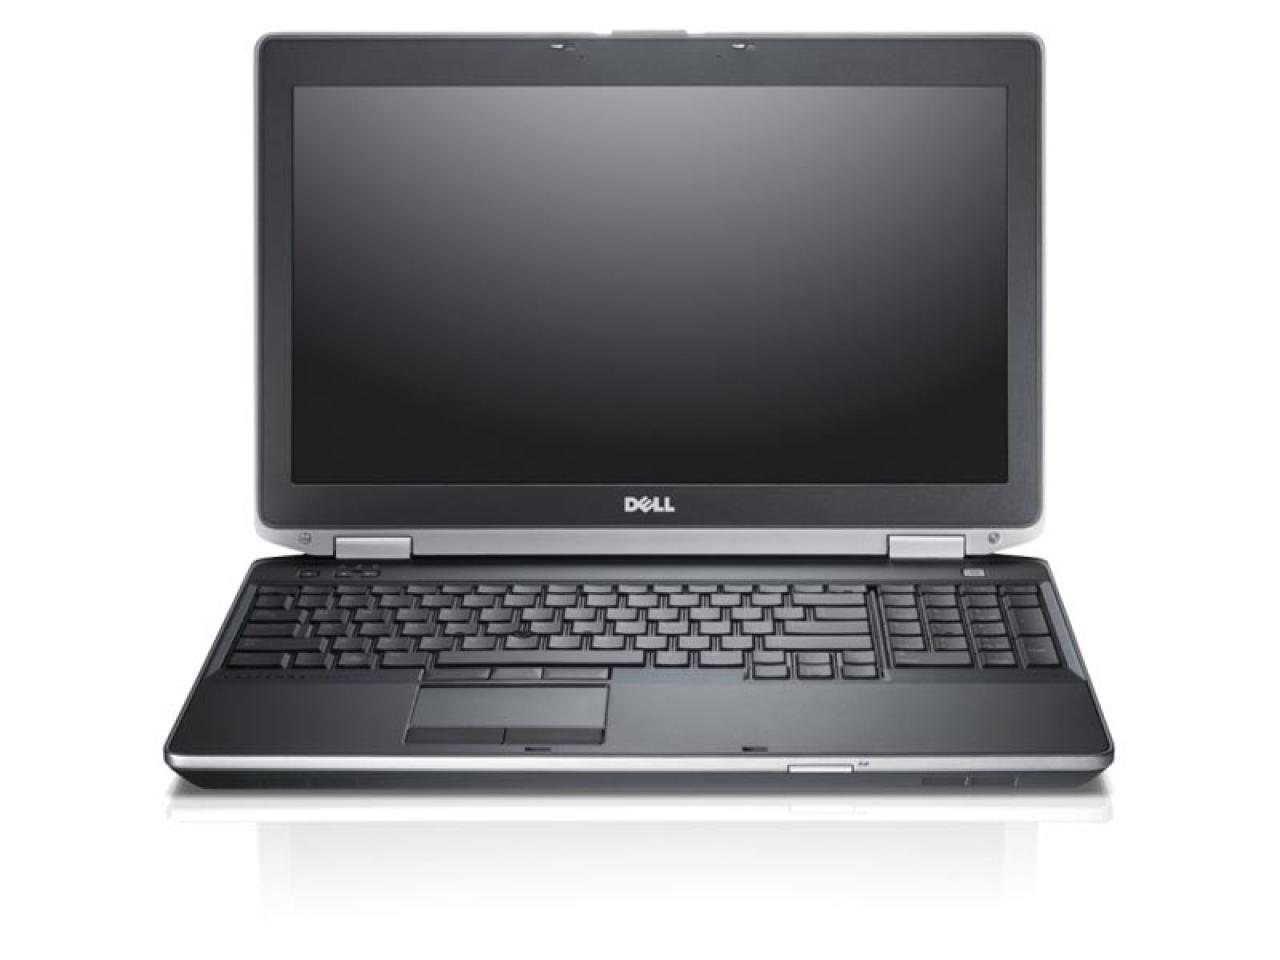 Dell Latitude E6530  - shop.bb-net.de